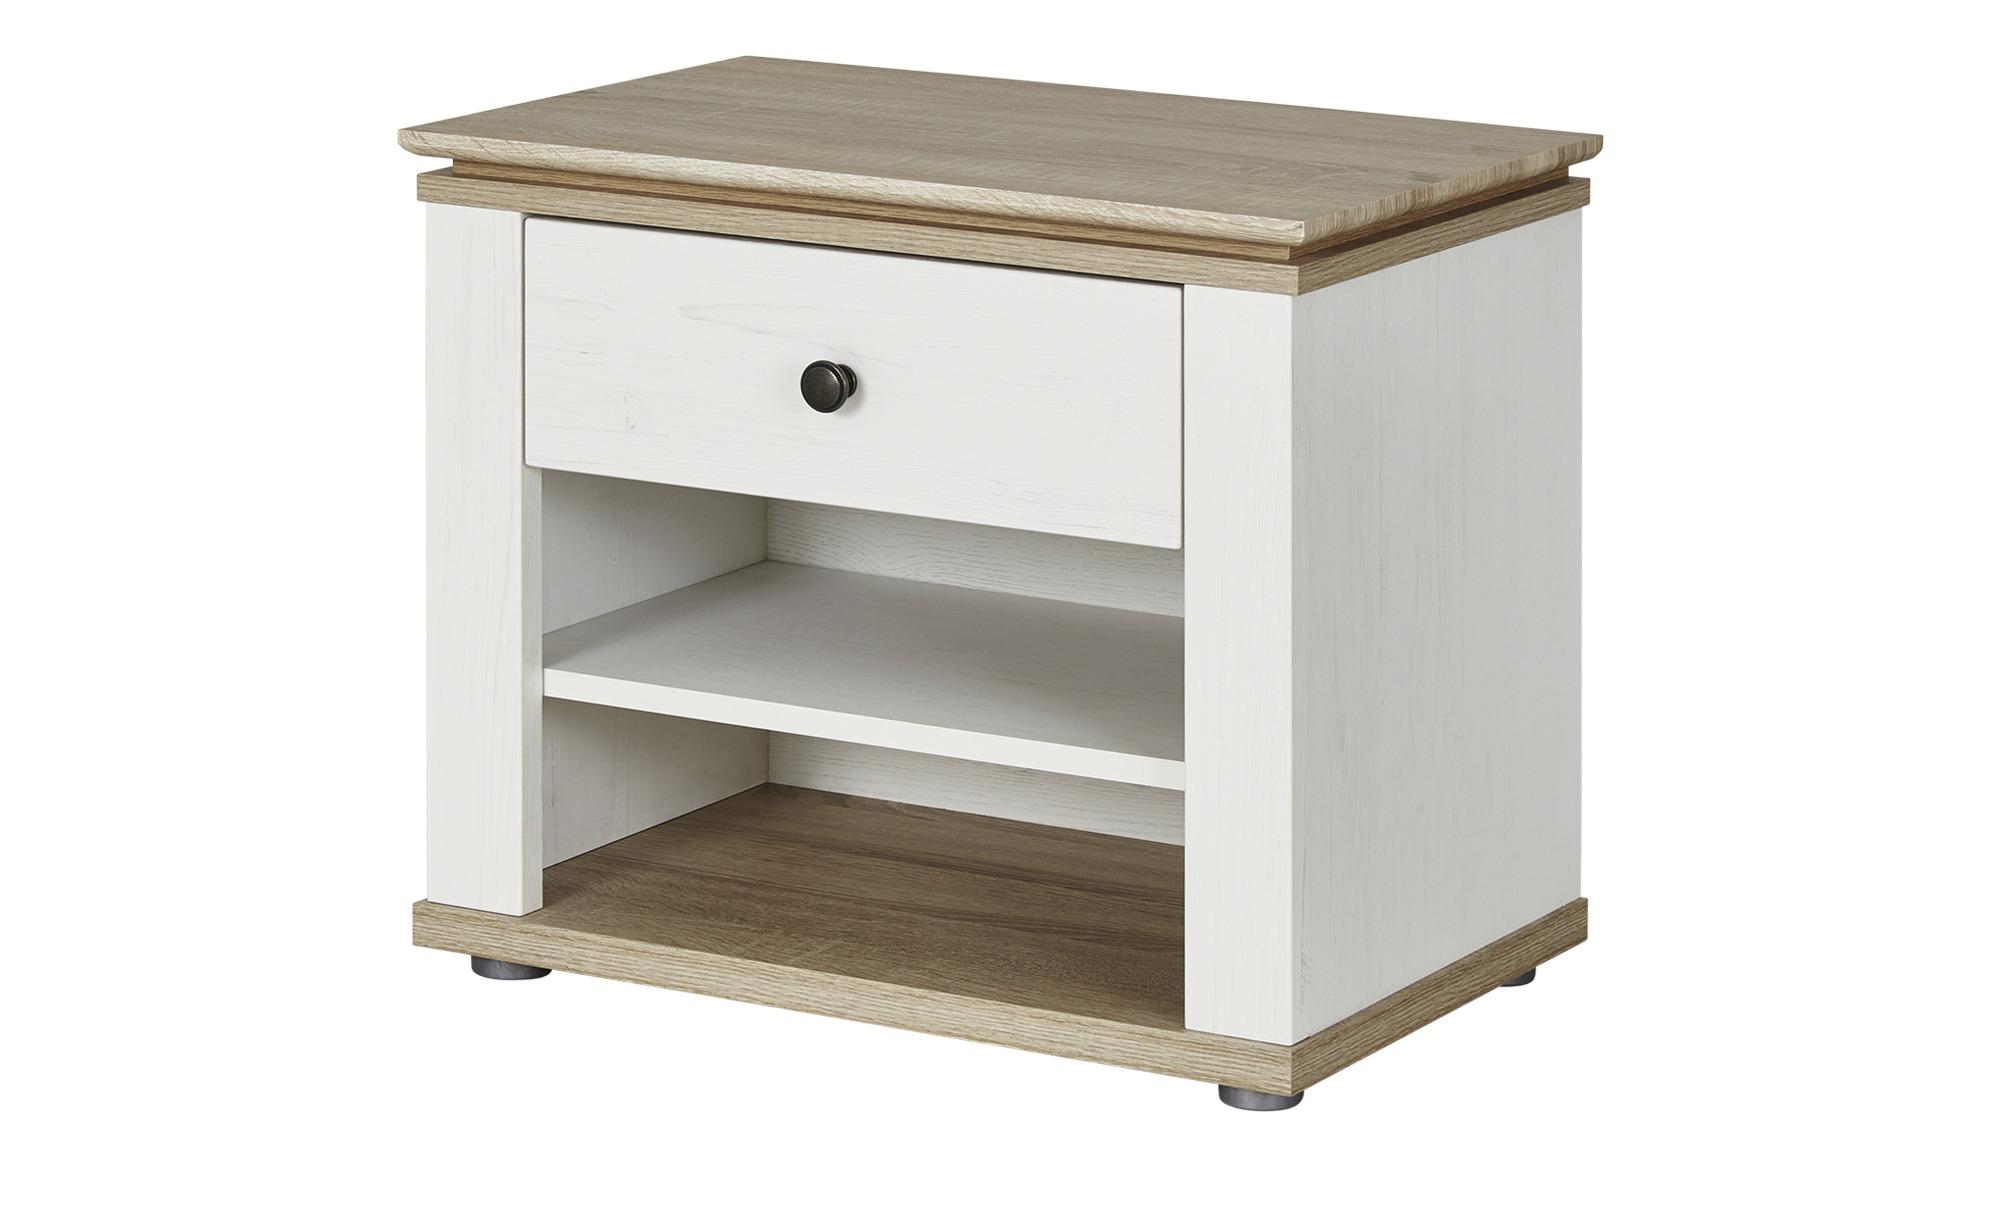 nachtkommode carmen breite 58 cm h he 50 cm wei online. Black Bedroom Furniture Sets. Home Design Ideas